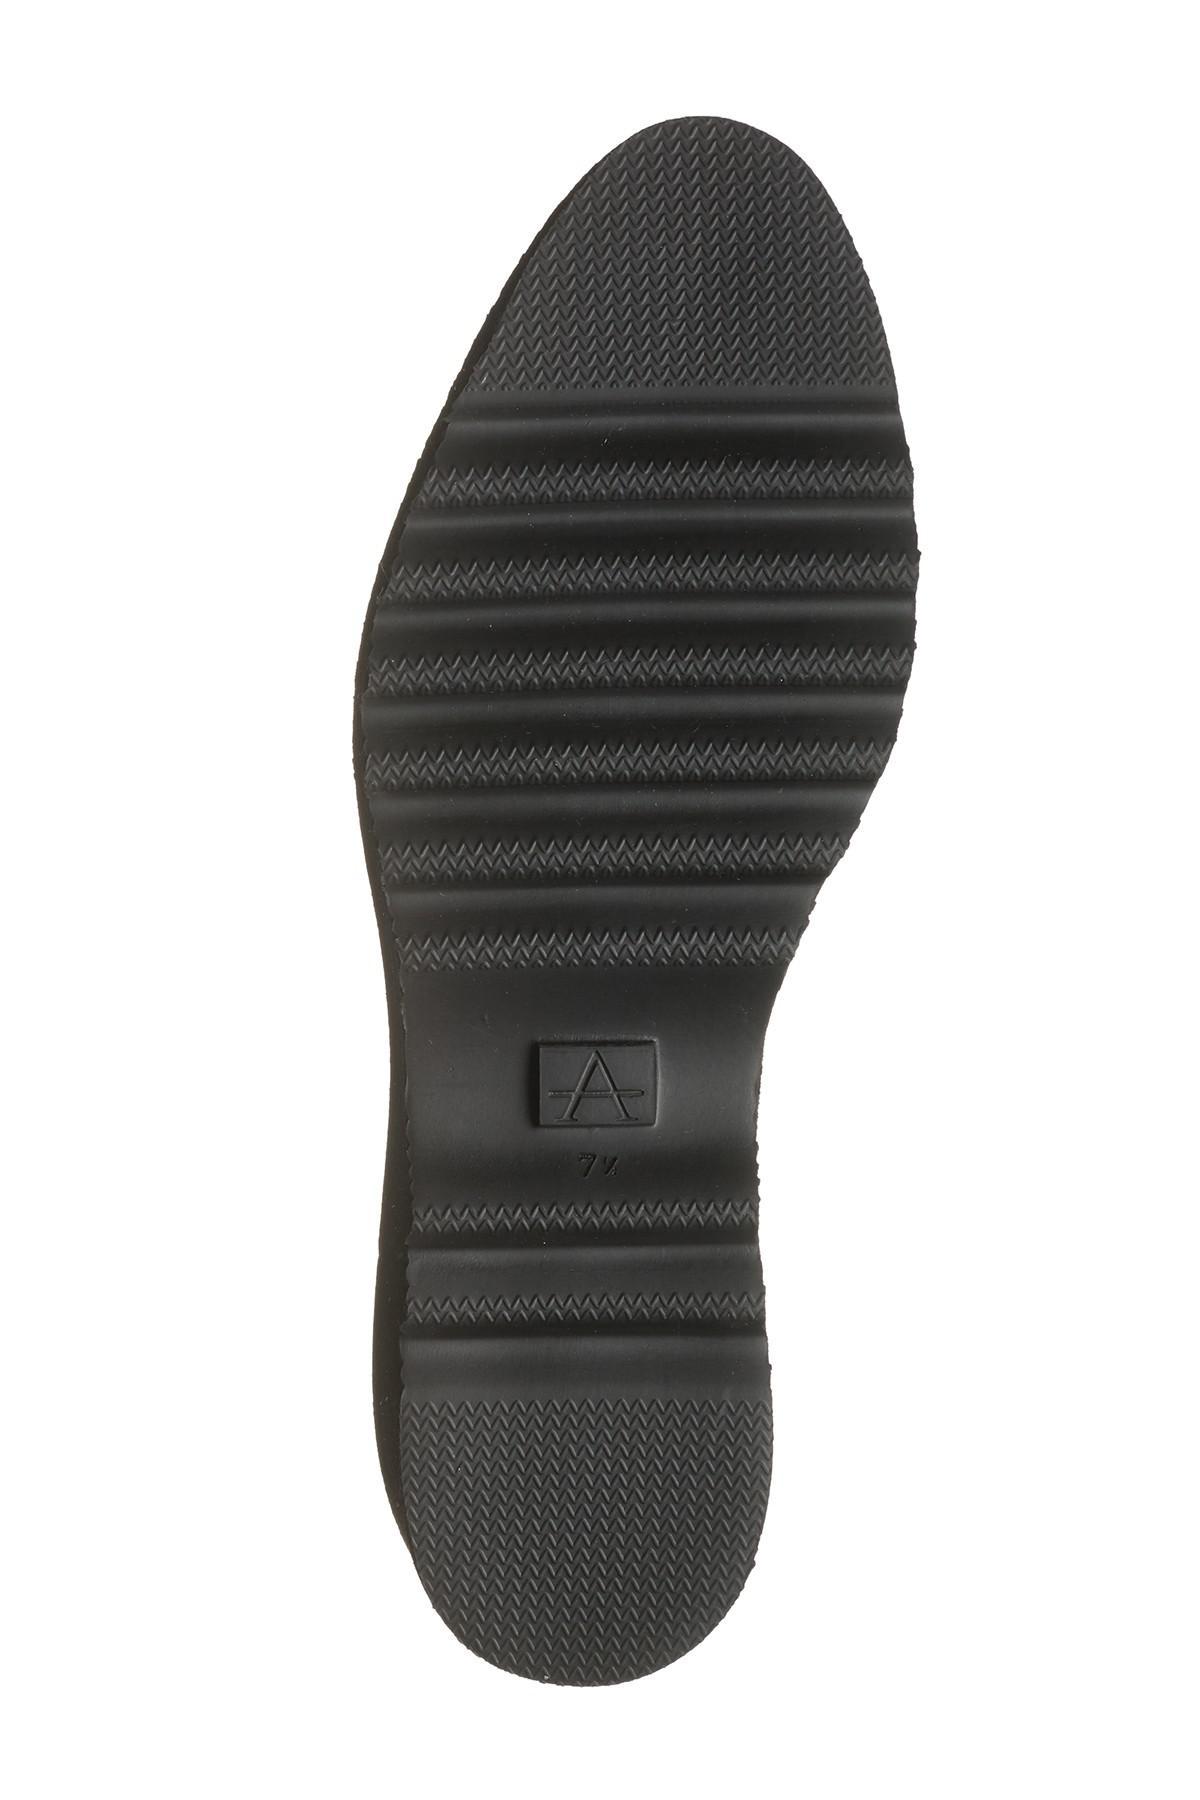 8834374be3b Lyst - Aquatalia Kelsey Mini Embossed Suede Platform Loafer in Black